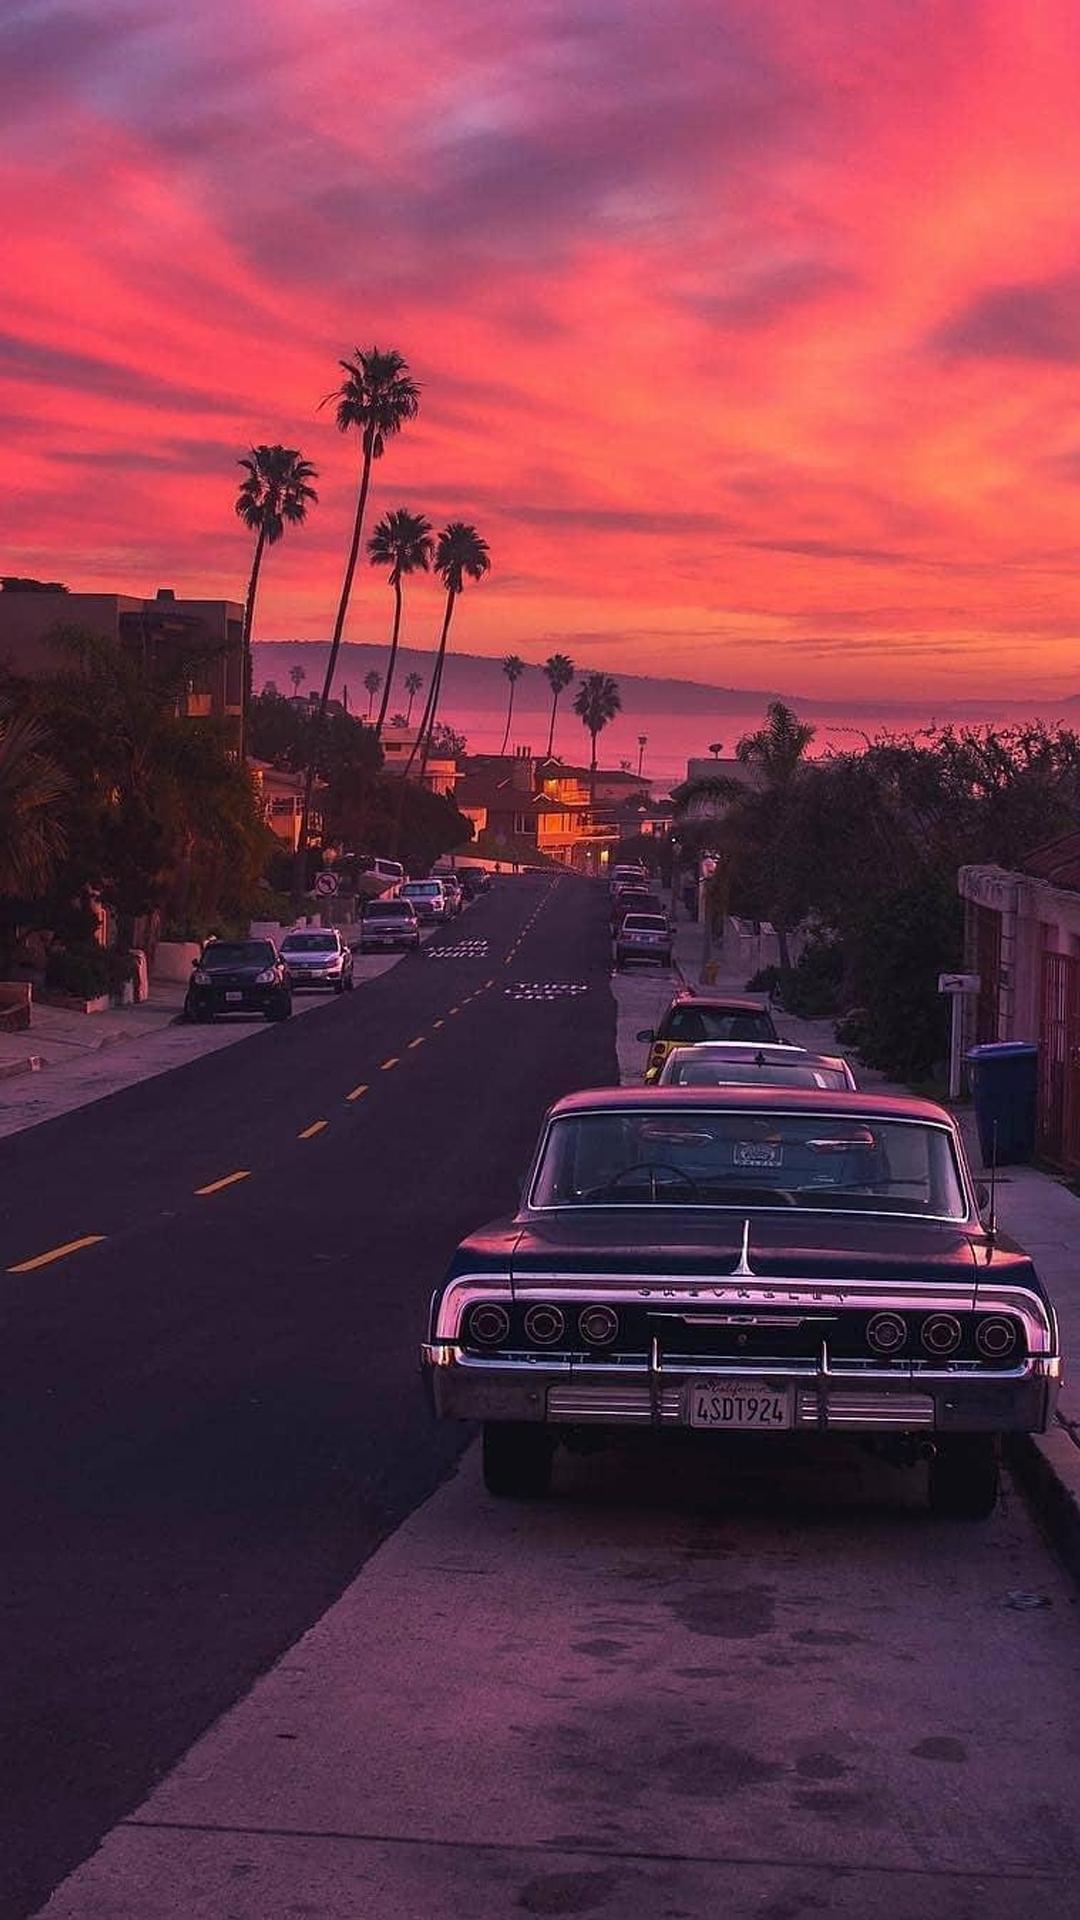 Evening Sunset street mobile wallpaper